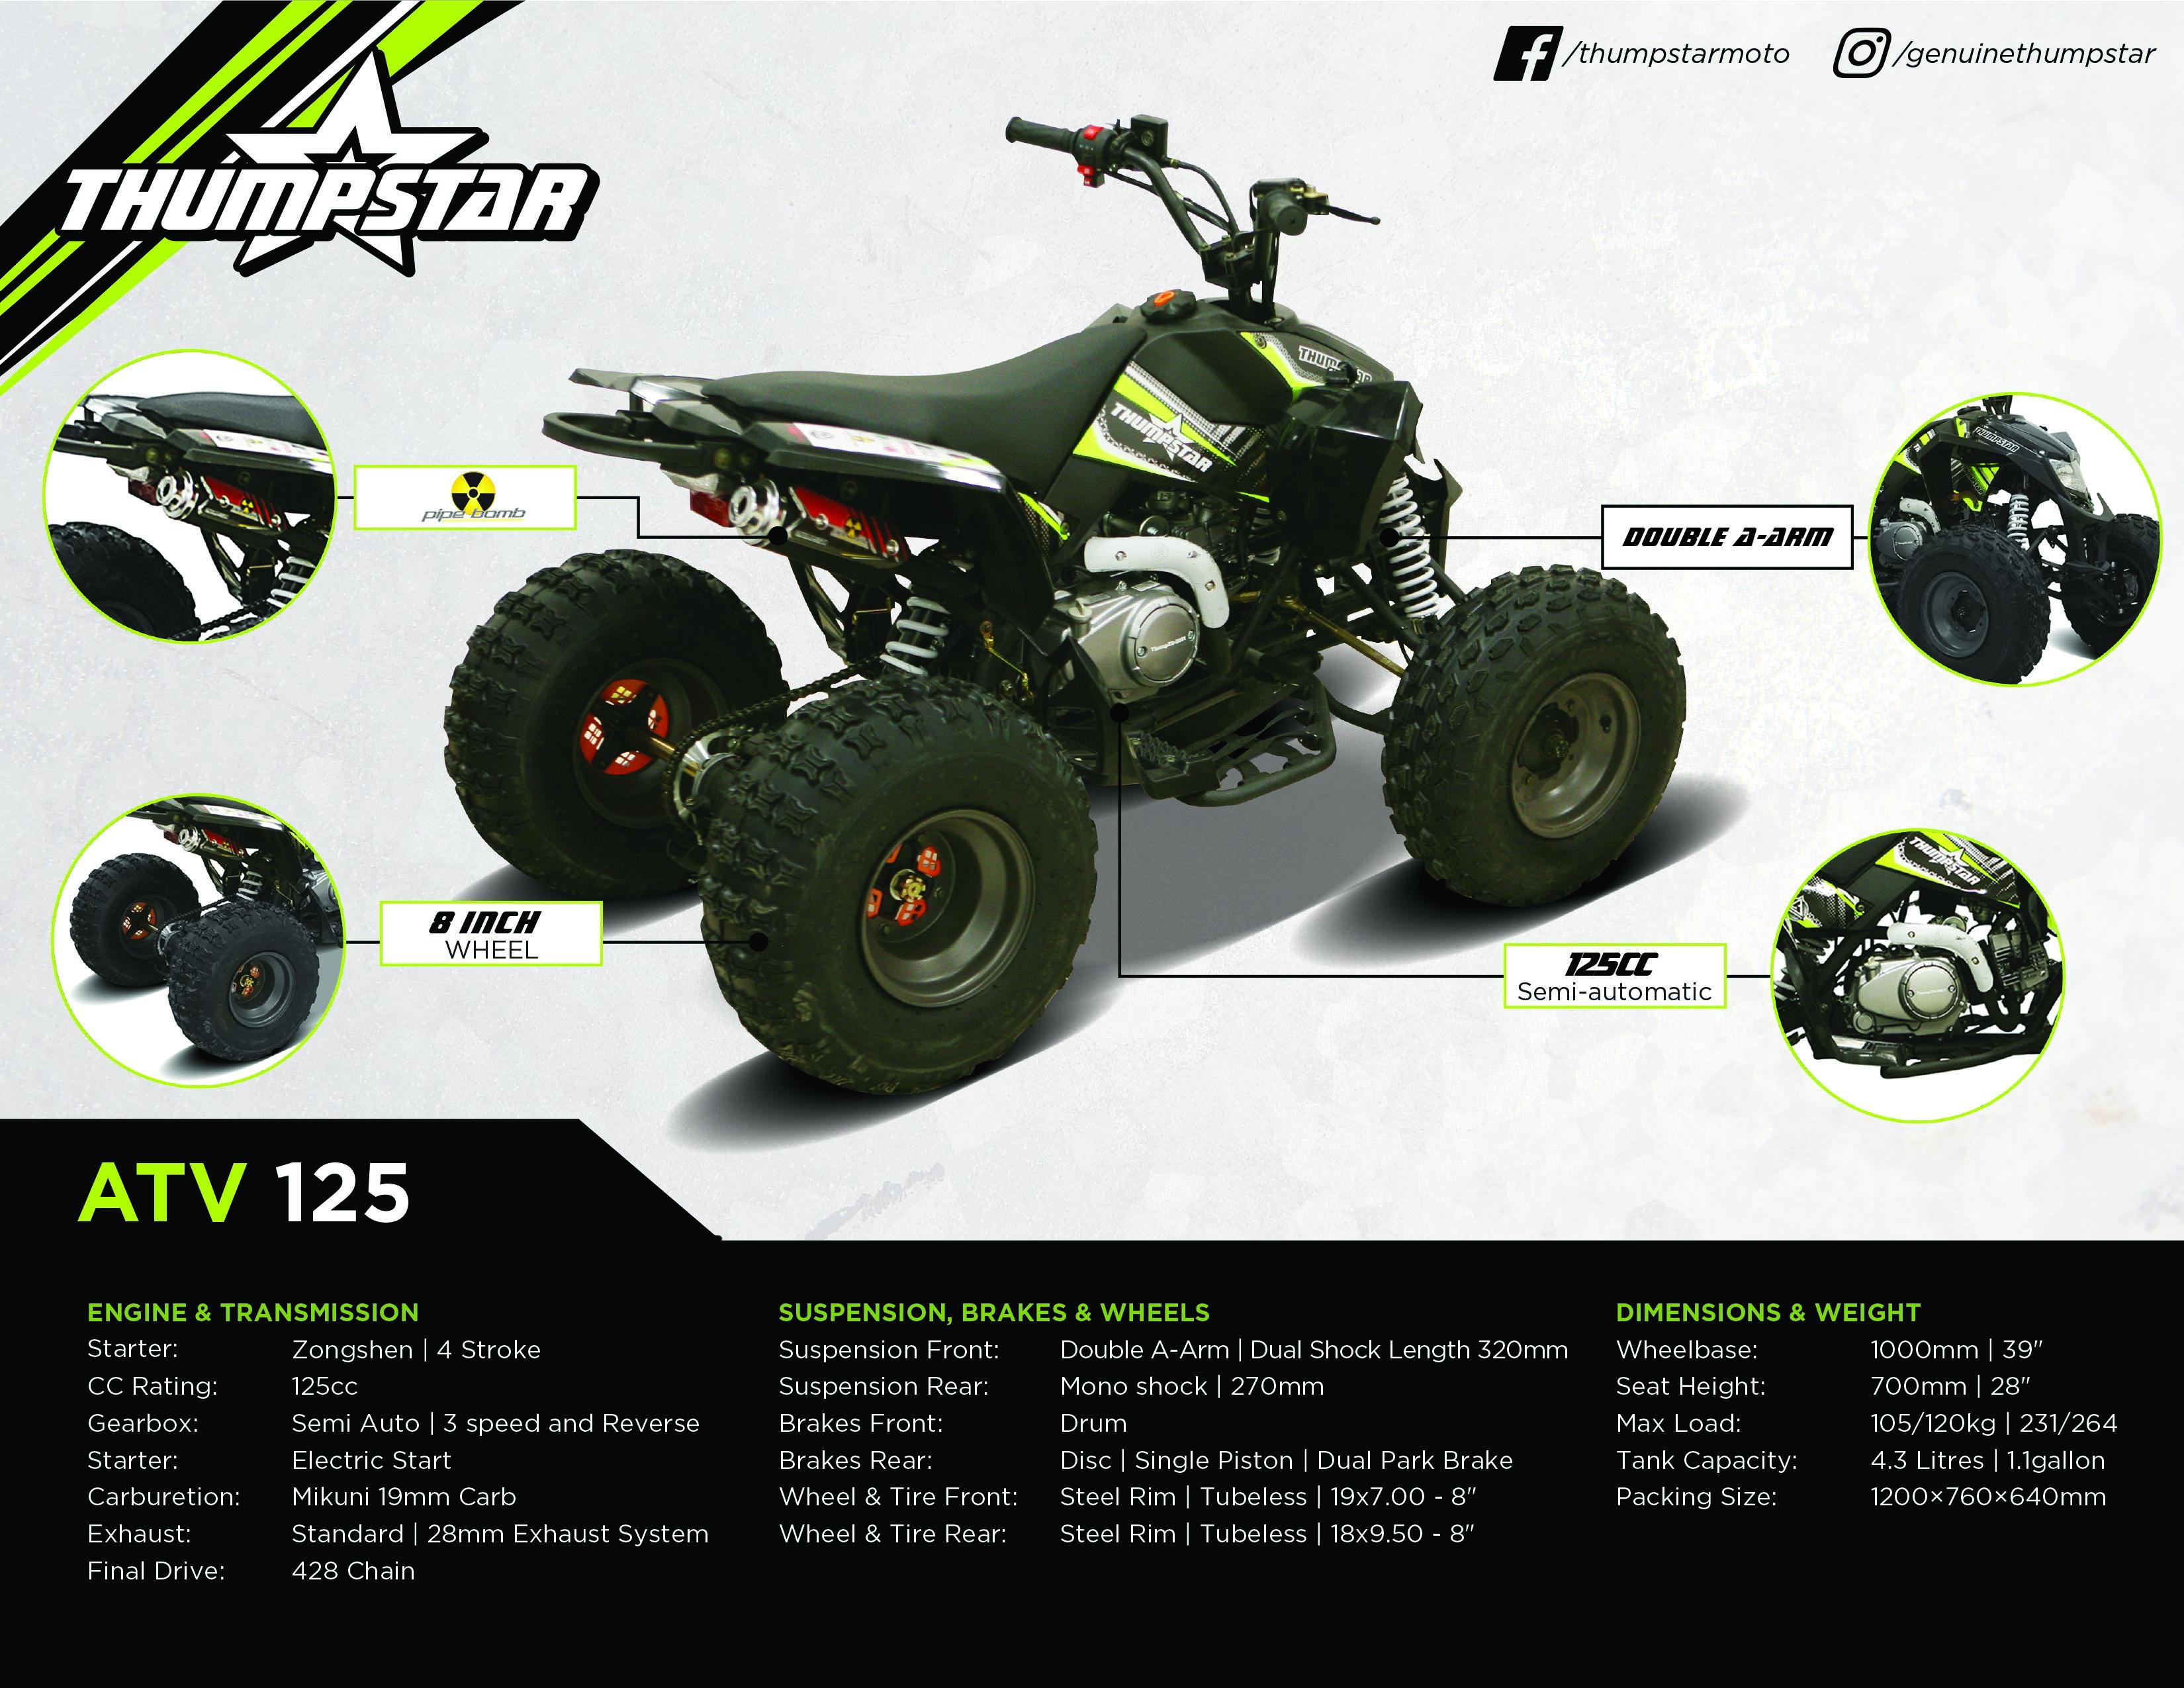 Thumpstar - ATV 125cc